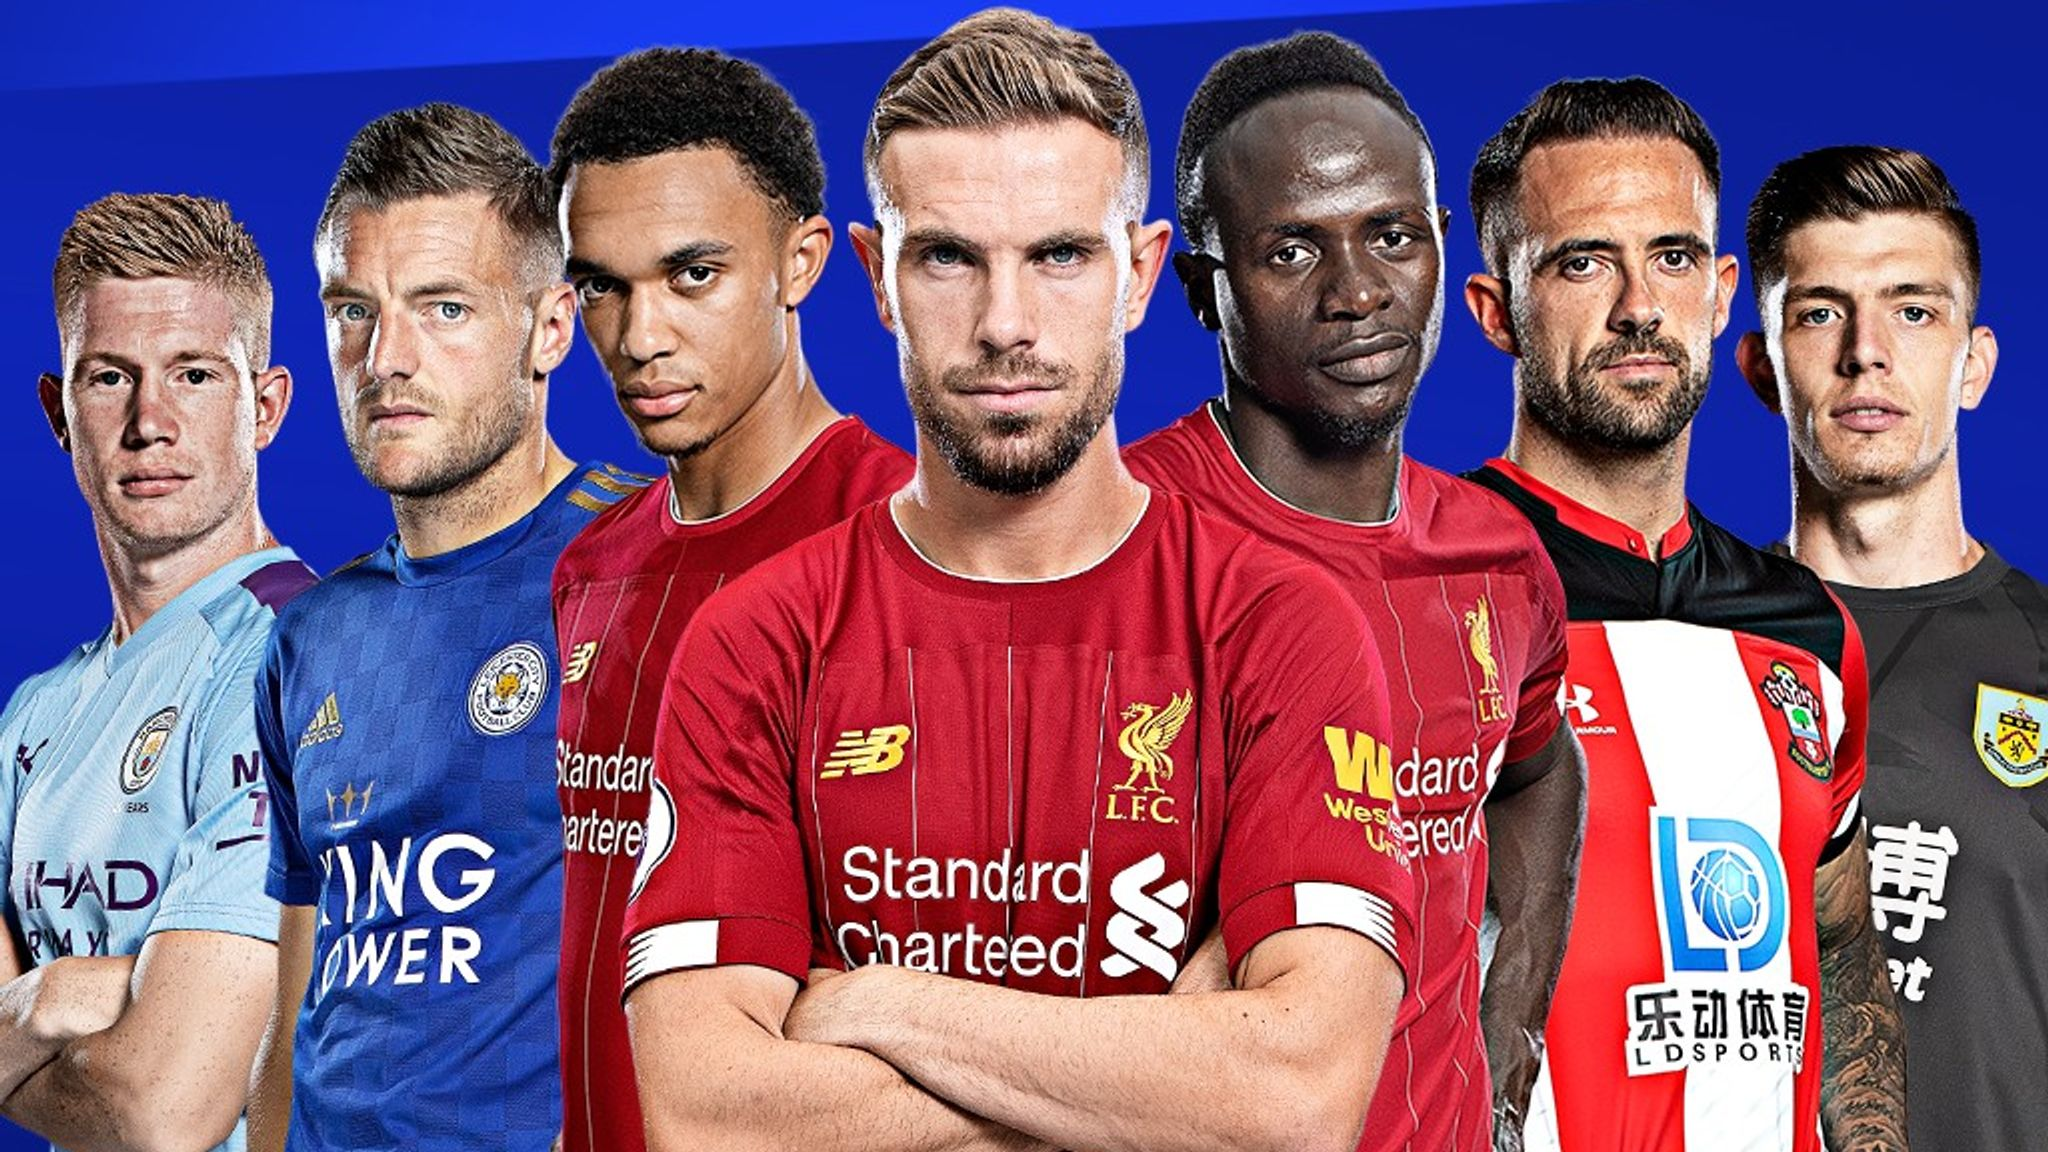 Jordan Henderson Trent Alexander Arnold And Sadio Mane Among Player Of The Season Nominees Football News Sky Sports